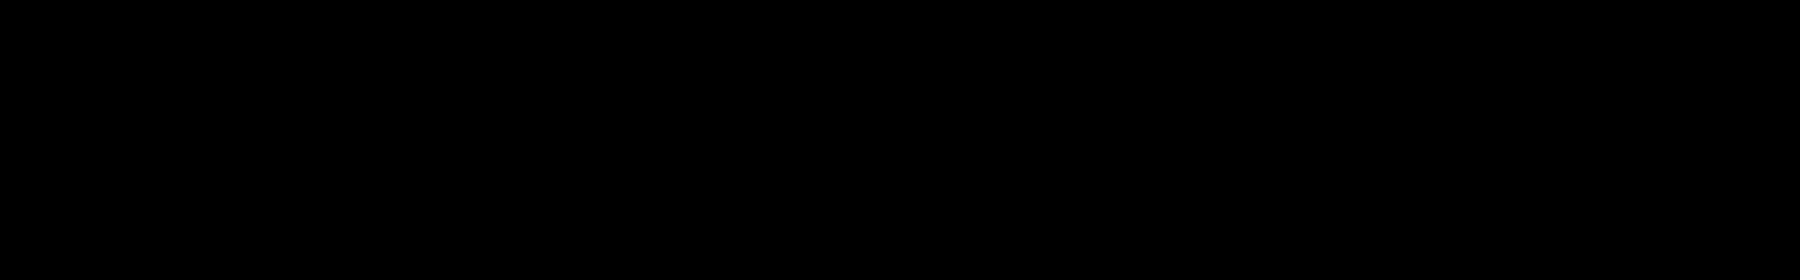 Techno Megapack audio waveform